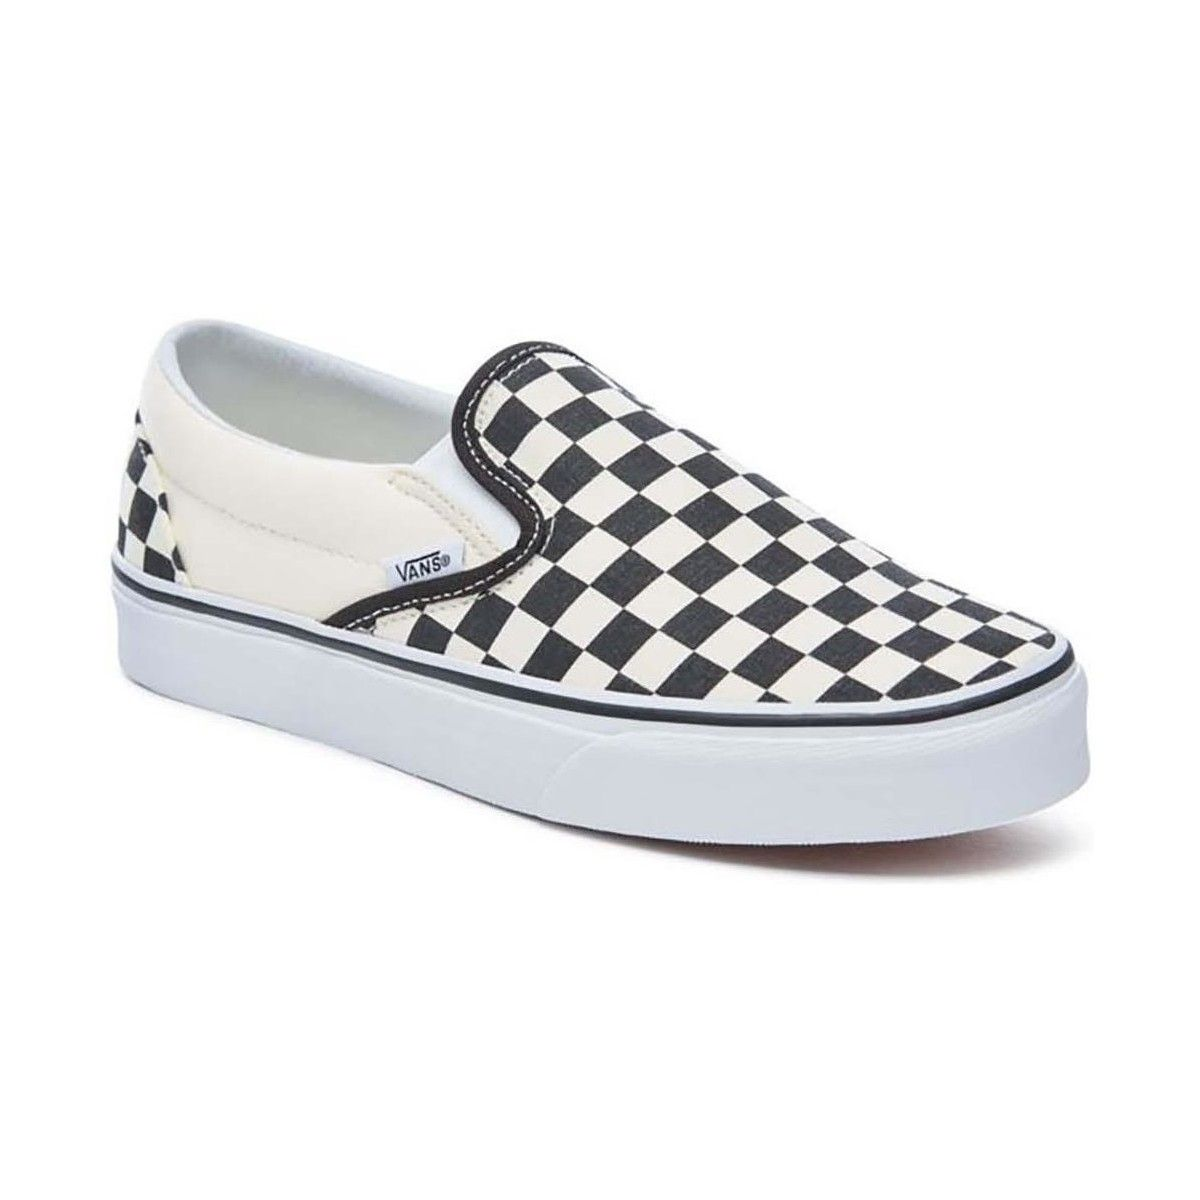 Vans - en 2021 | Vans sans lacets, Chaussures slip on, Vans chaussures